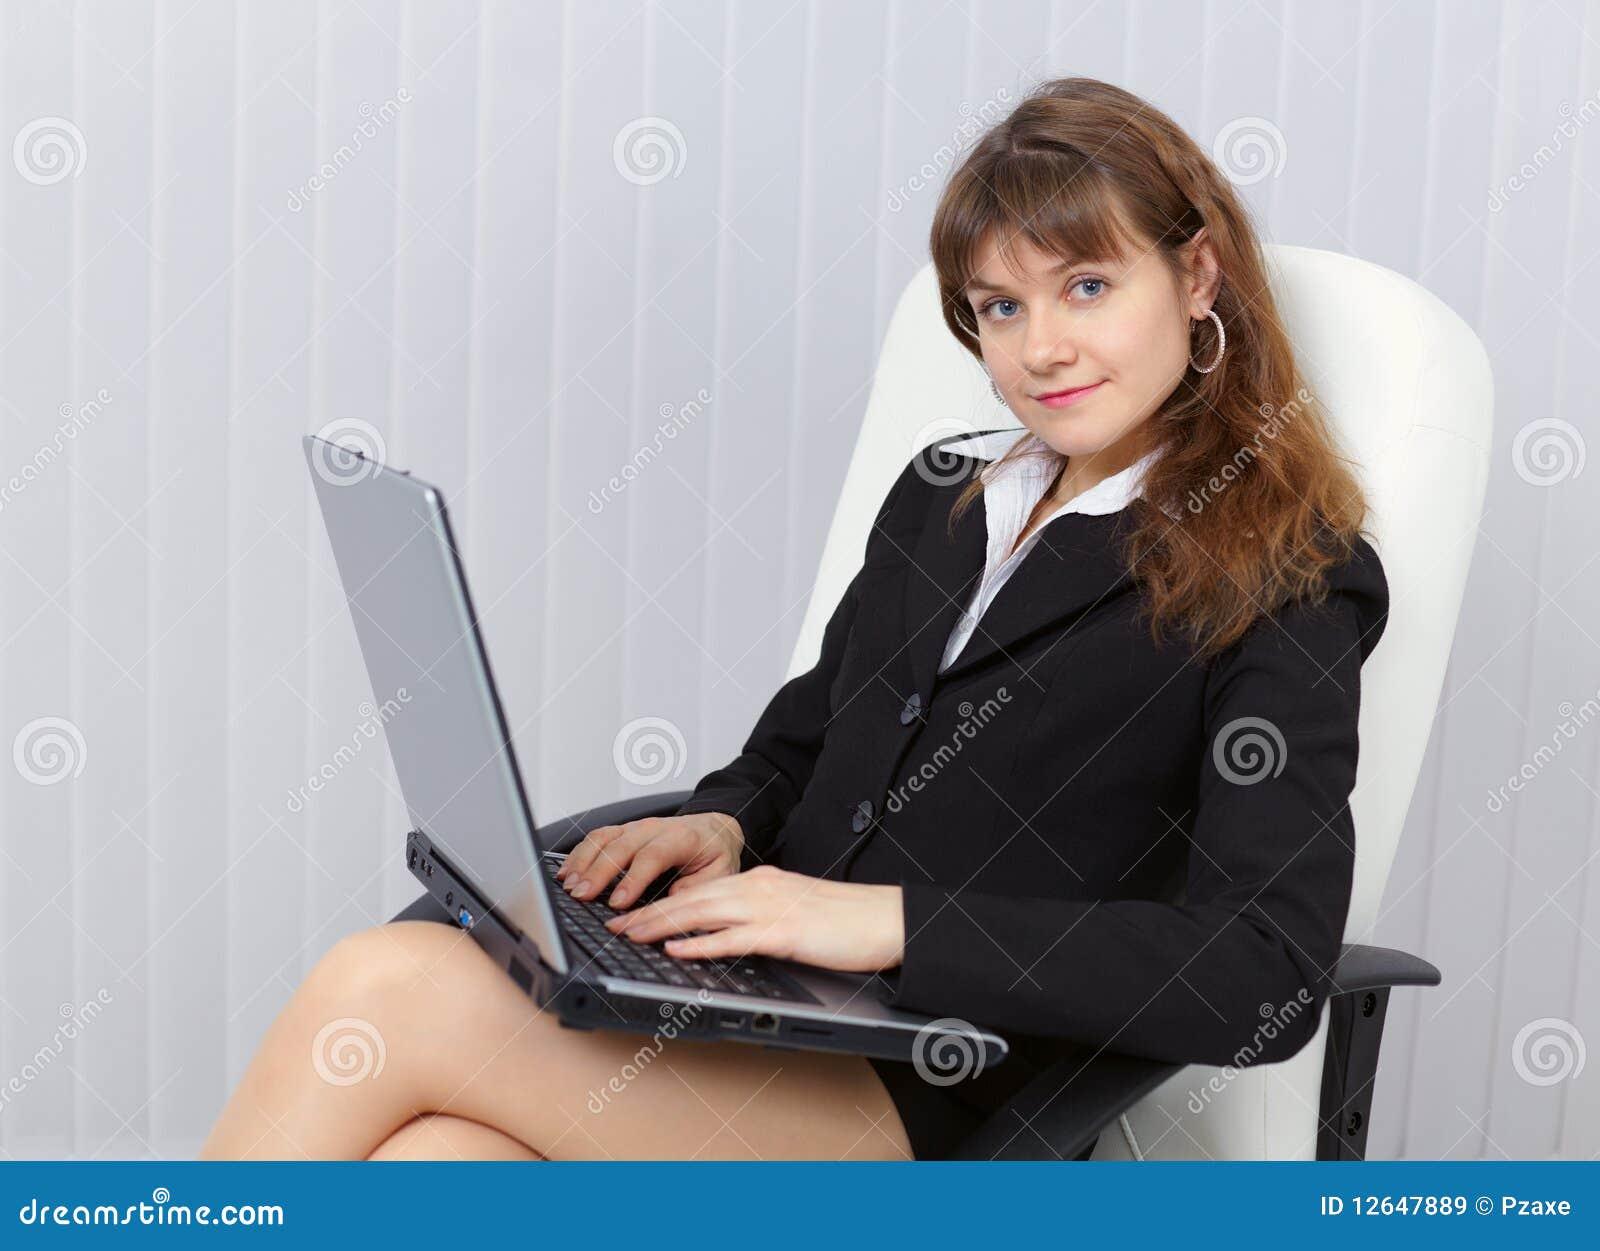 Вебка Порно Видео. Вебкам онлайн. Секс перед вебкамерой  TOPporno.tv